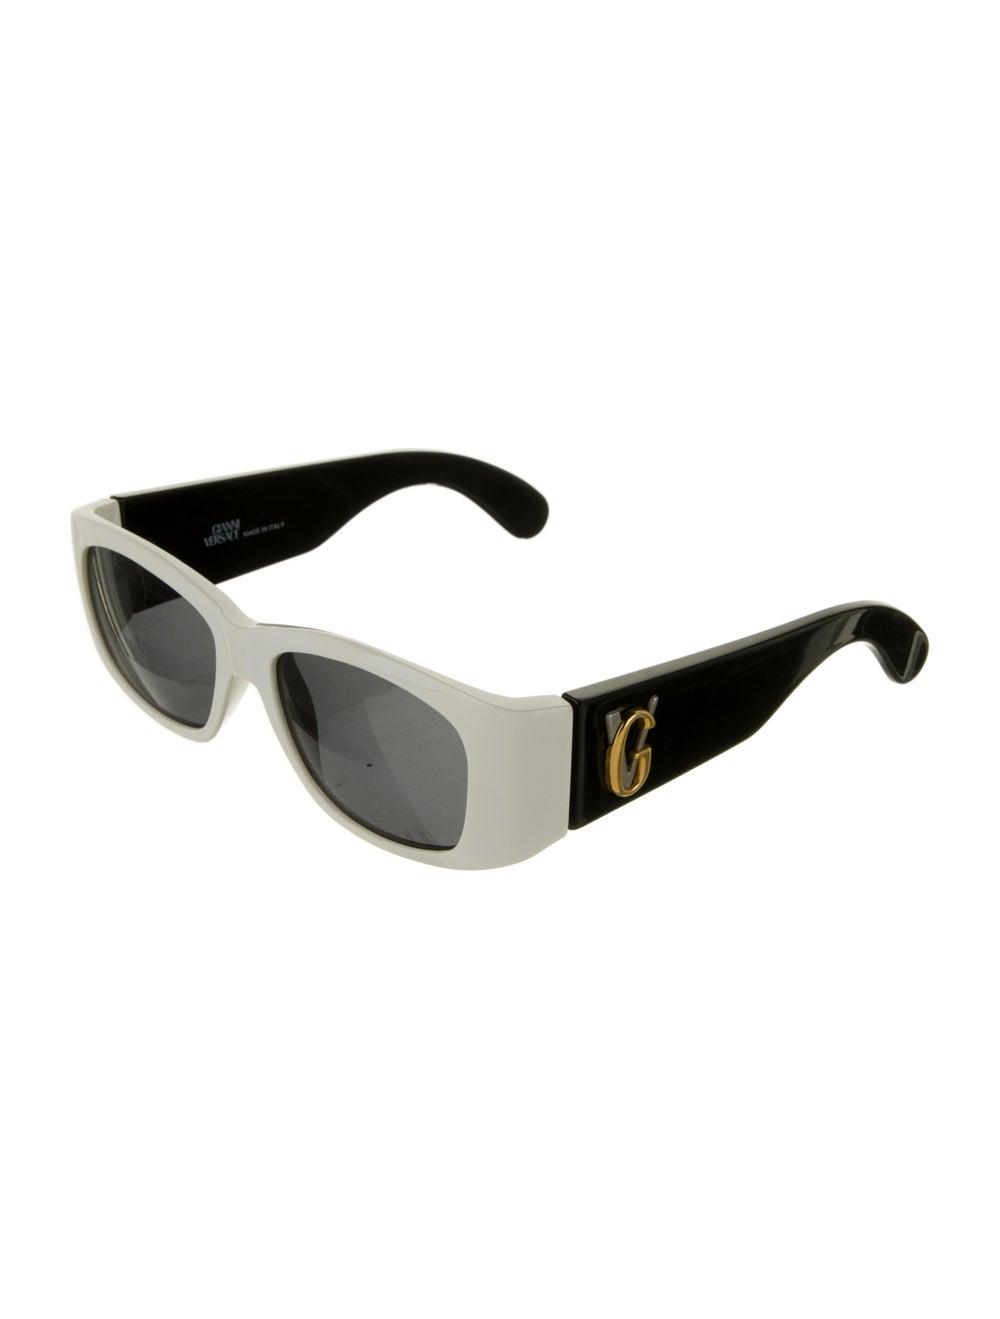 Gianni Versace Square Tinted Sunglasses Black - image 2